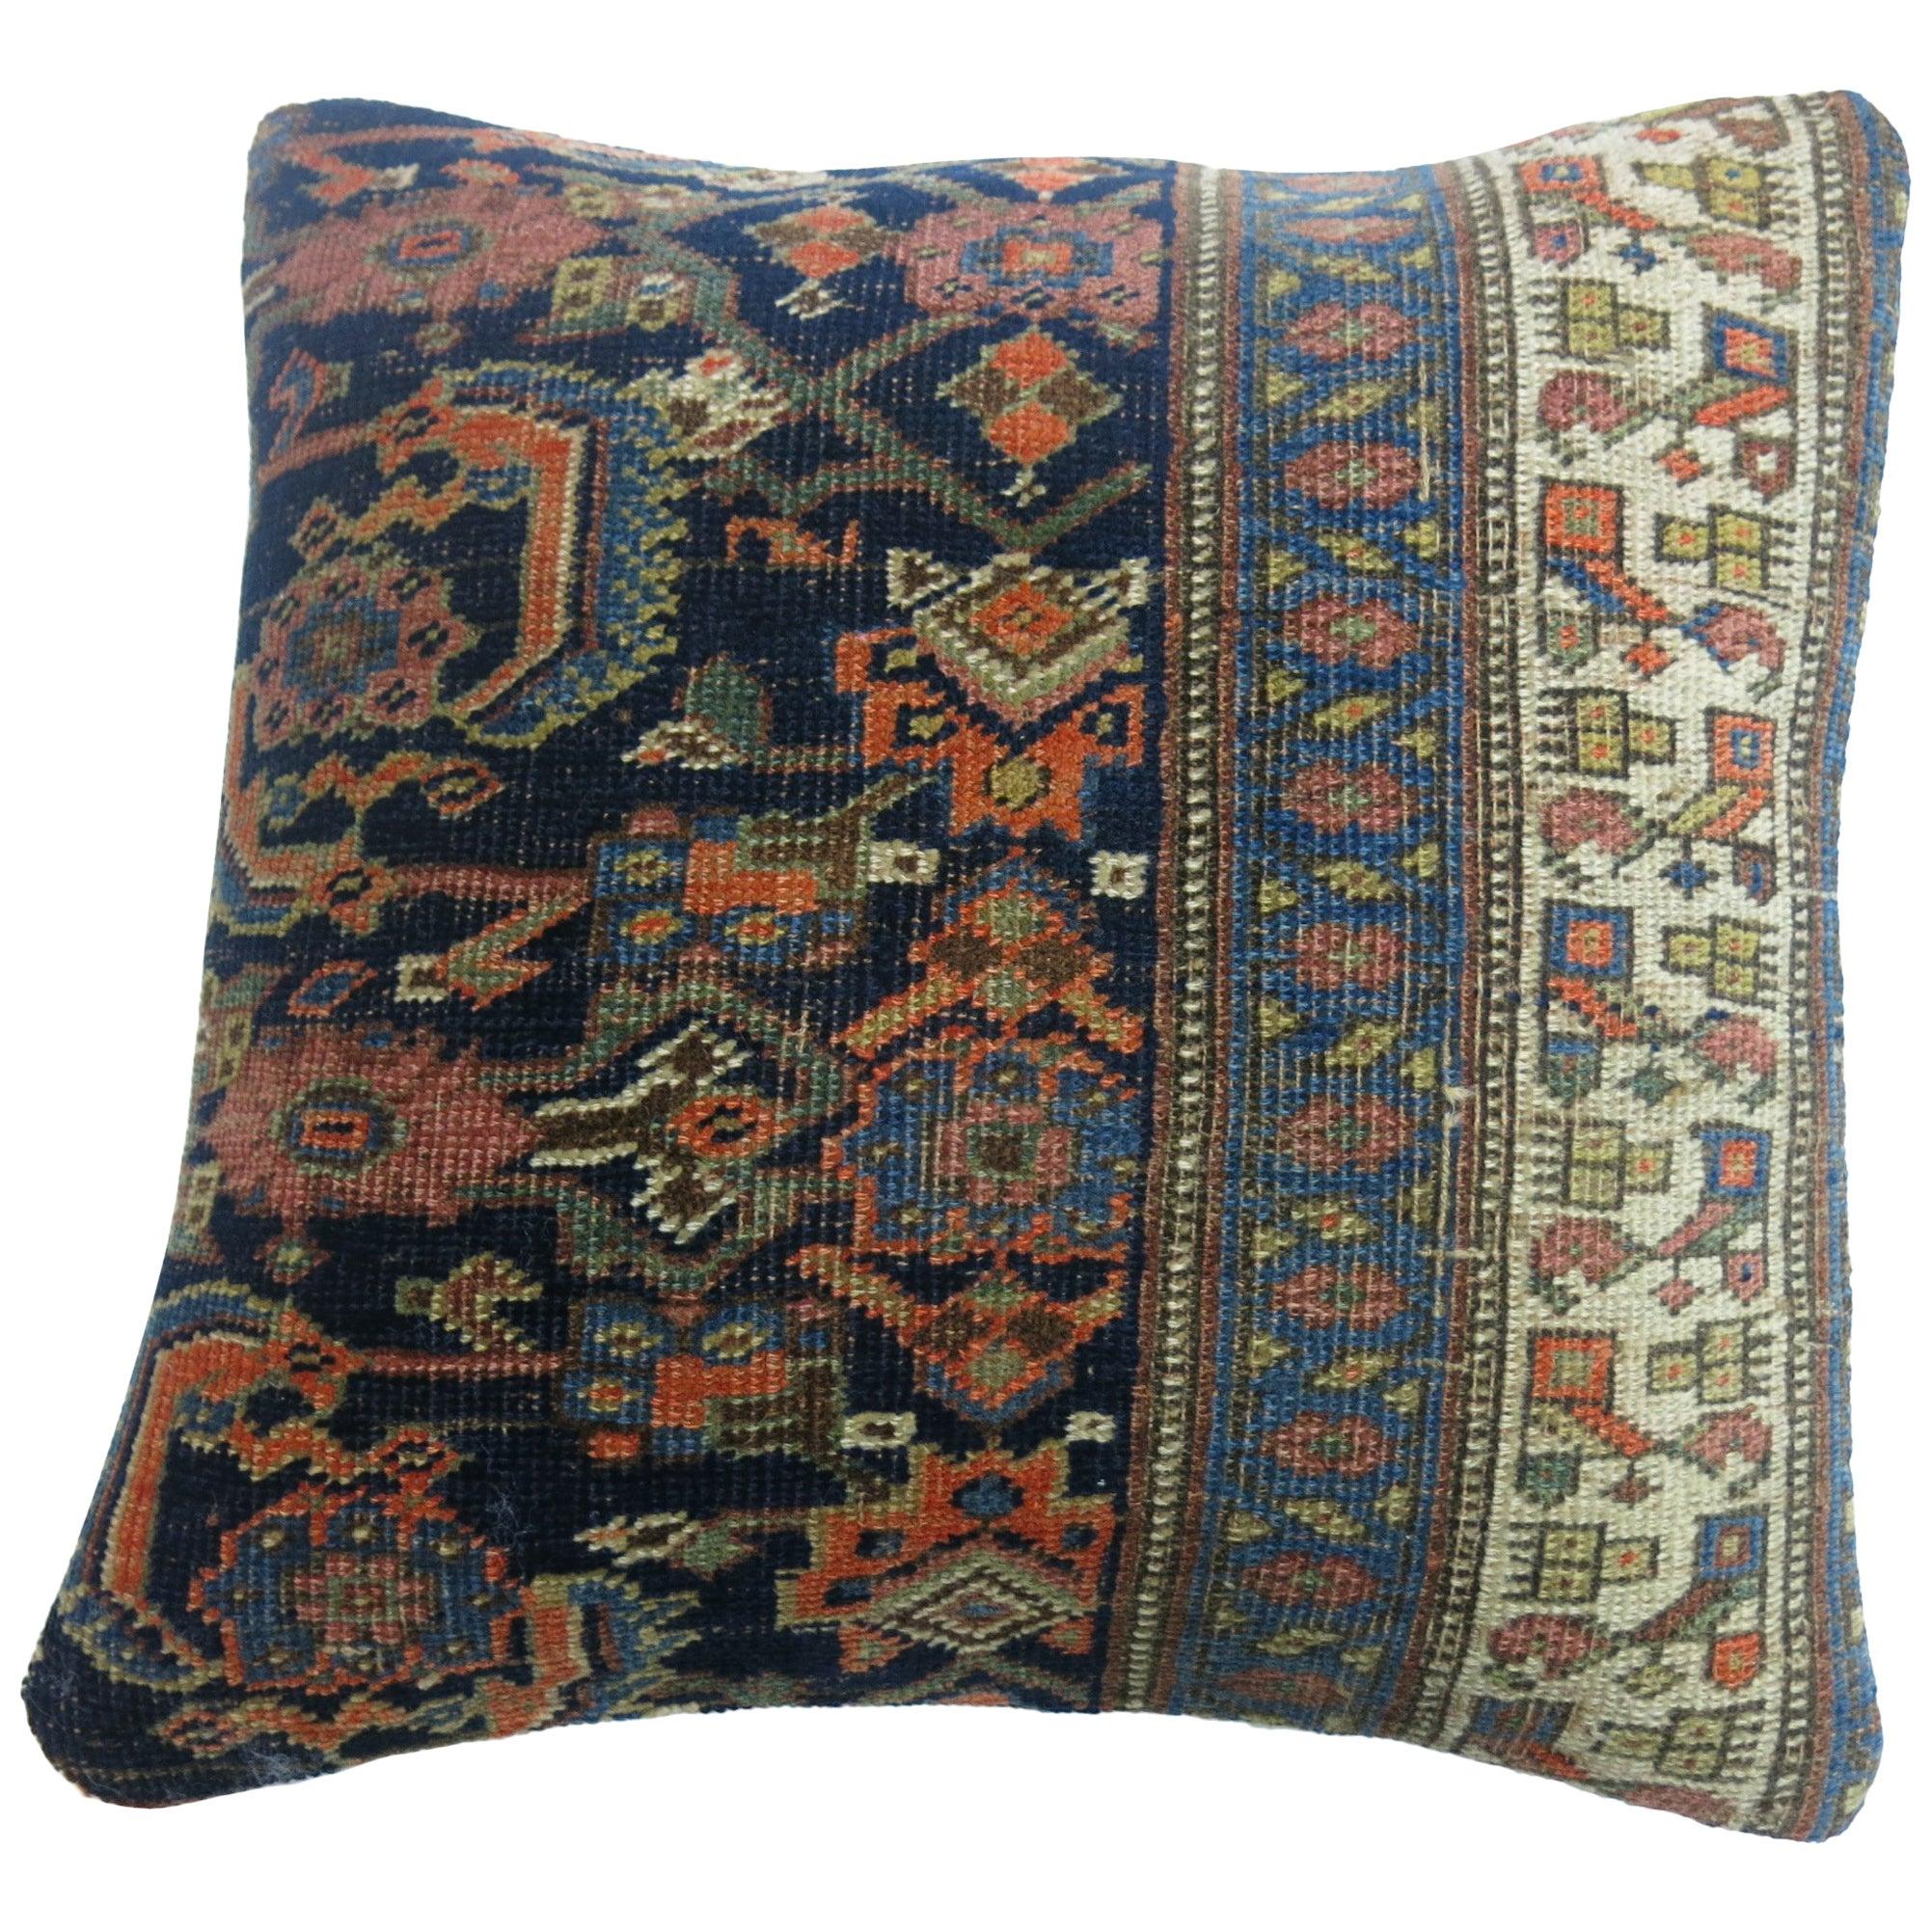 Antique Persian Bidjar Rug Pillow